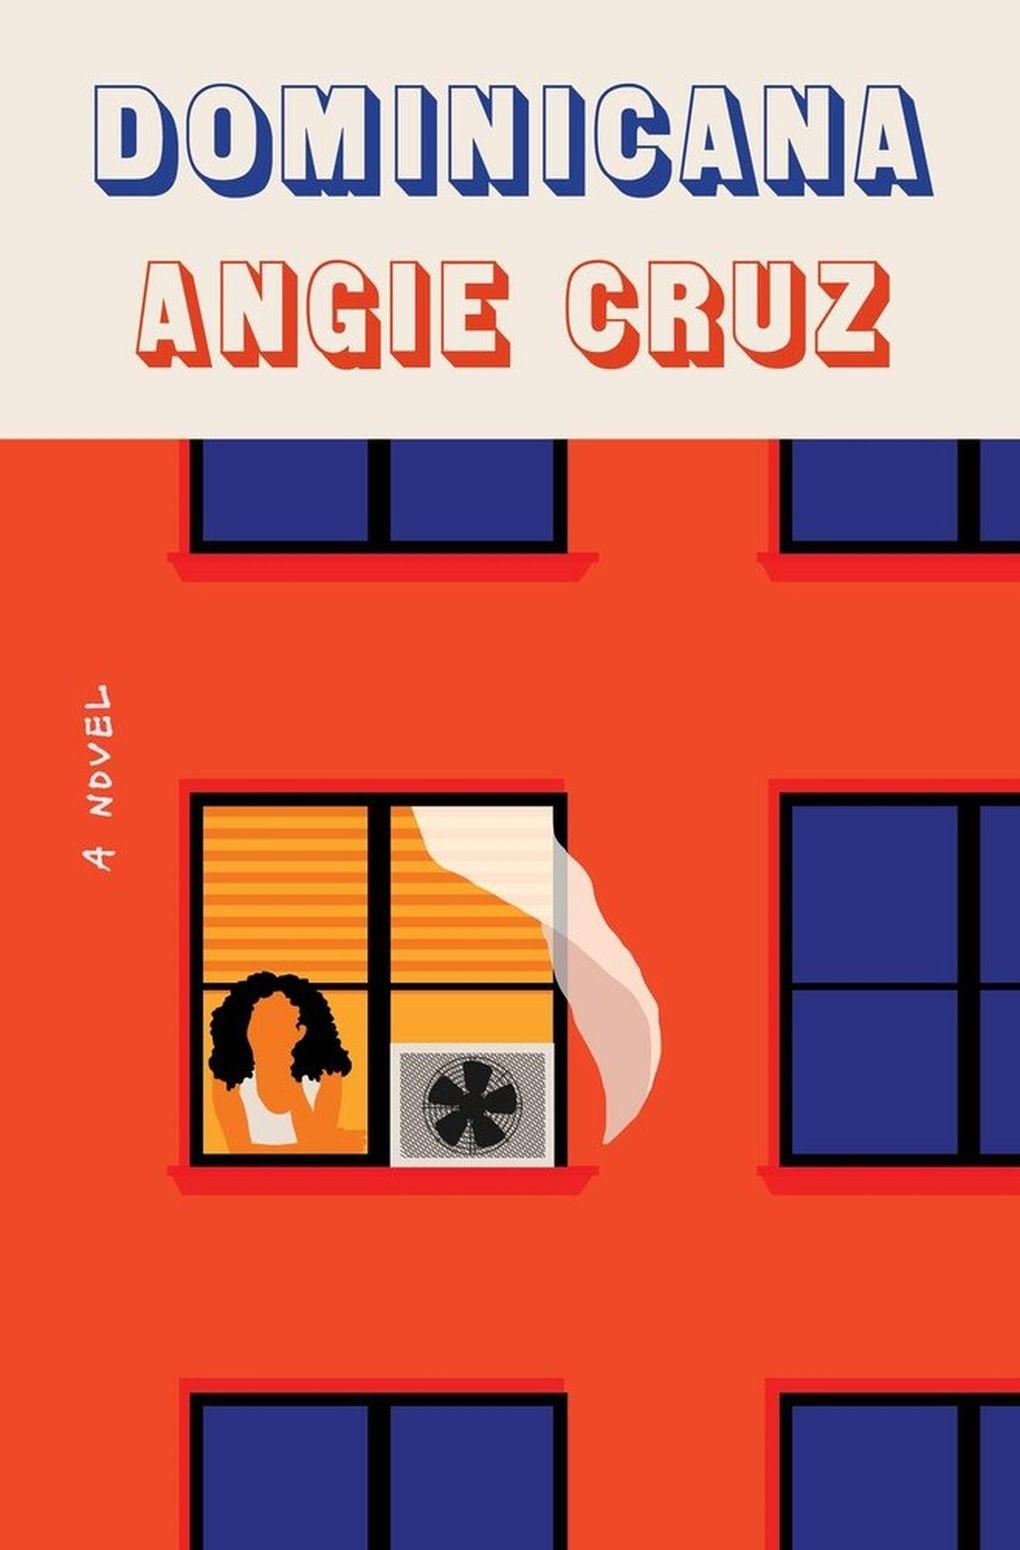 """Dominicana"" by Angie Cruz (Macmillan Publishers)"